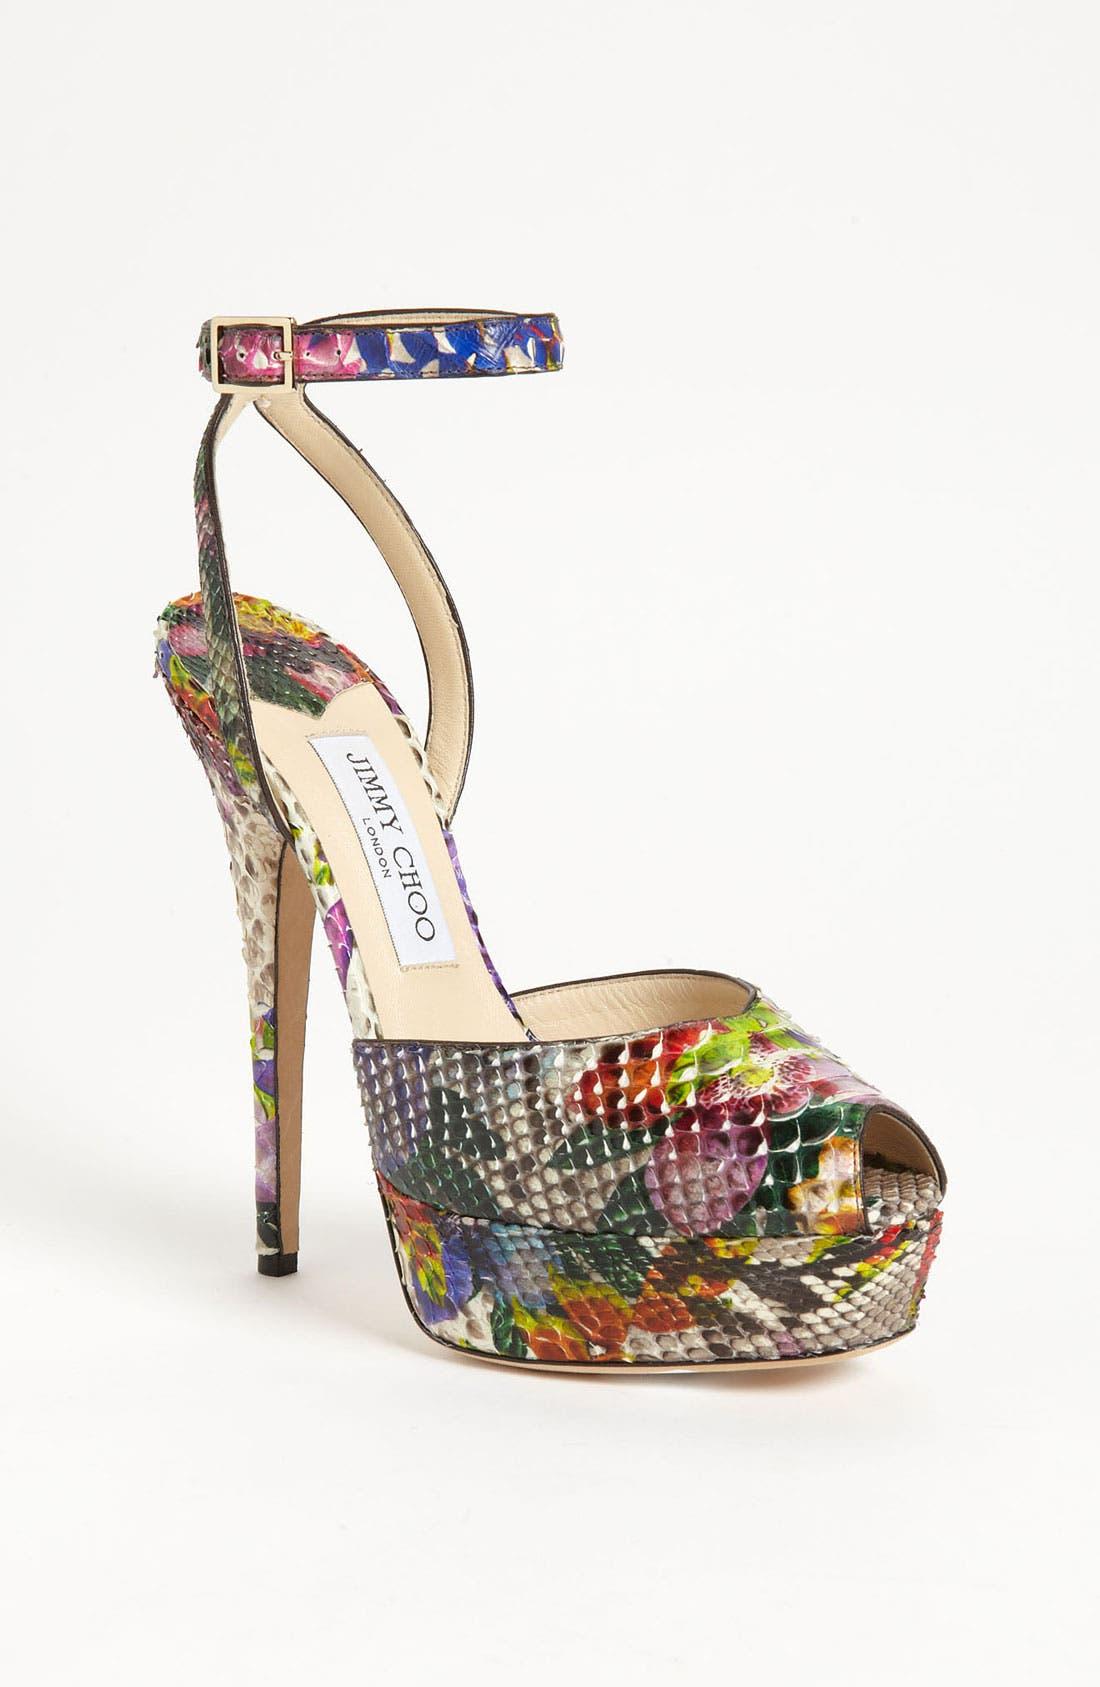 Alternate Image 1 Selected - Jimmy Choo 'Lola' Ankle Strap Sandal